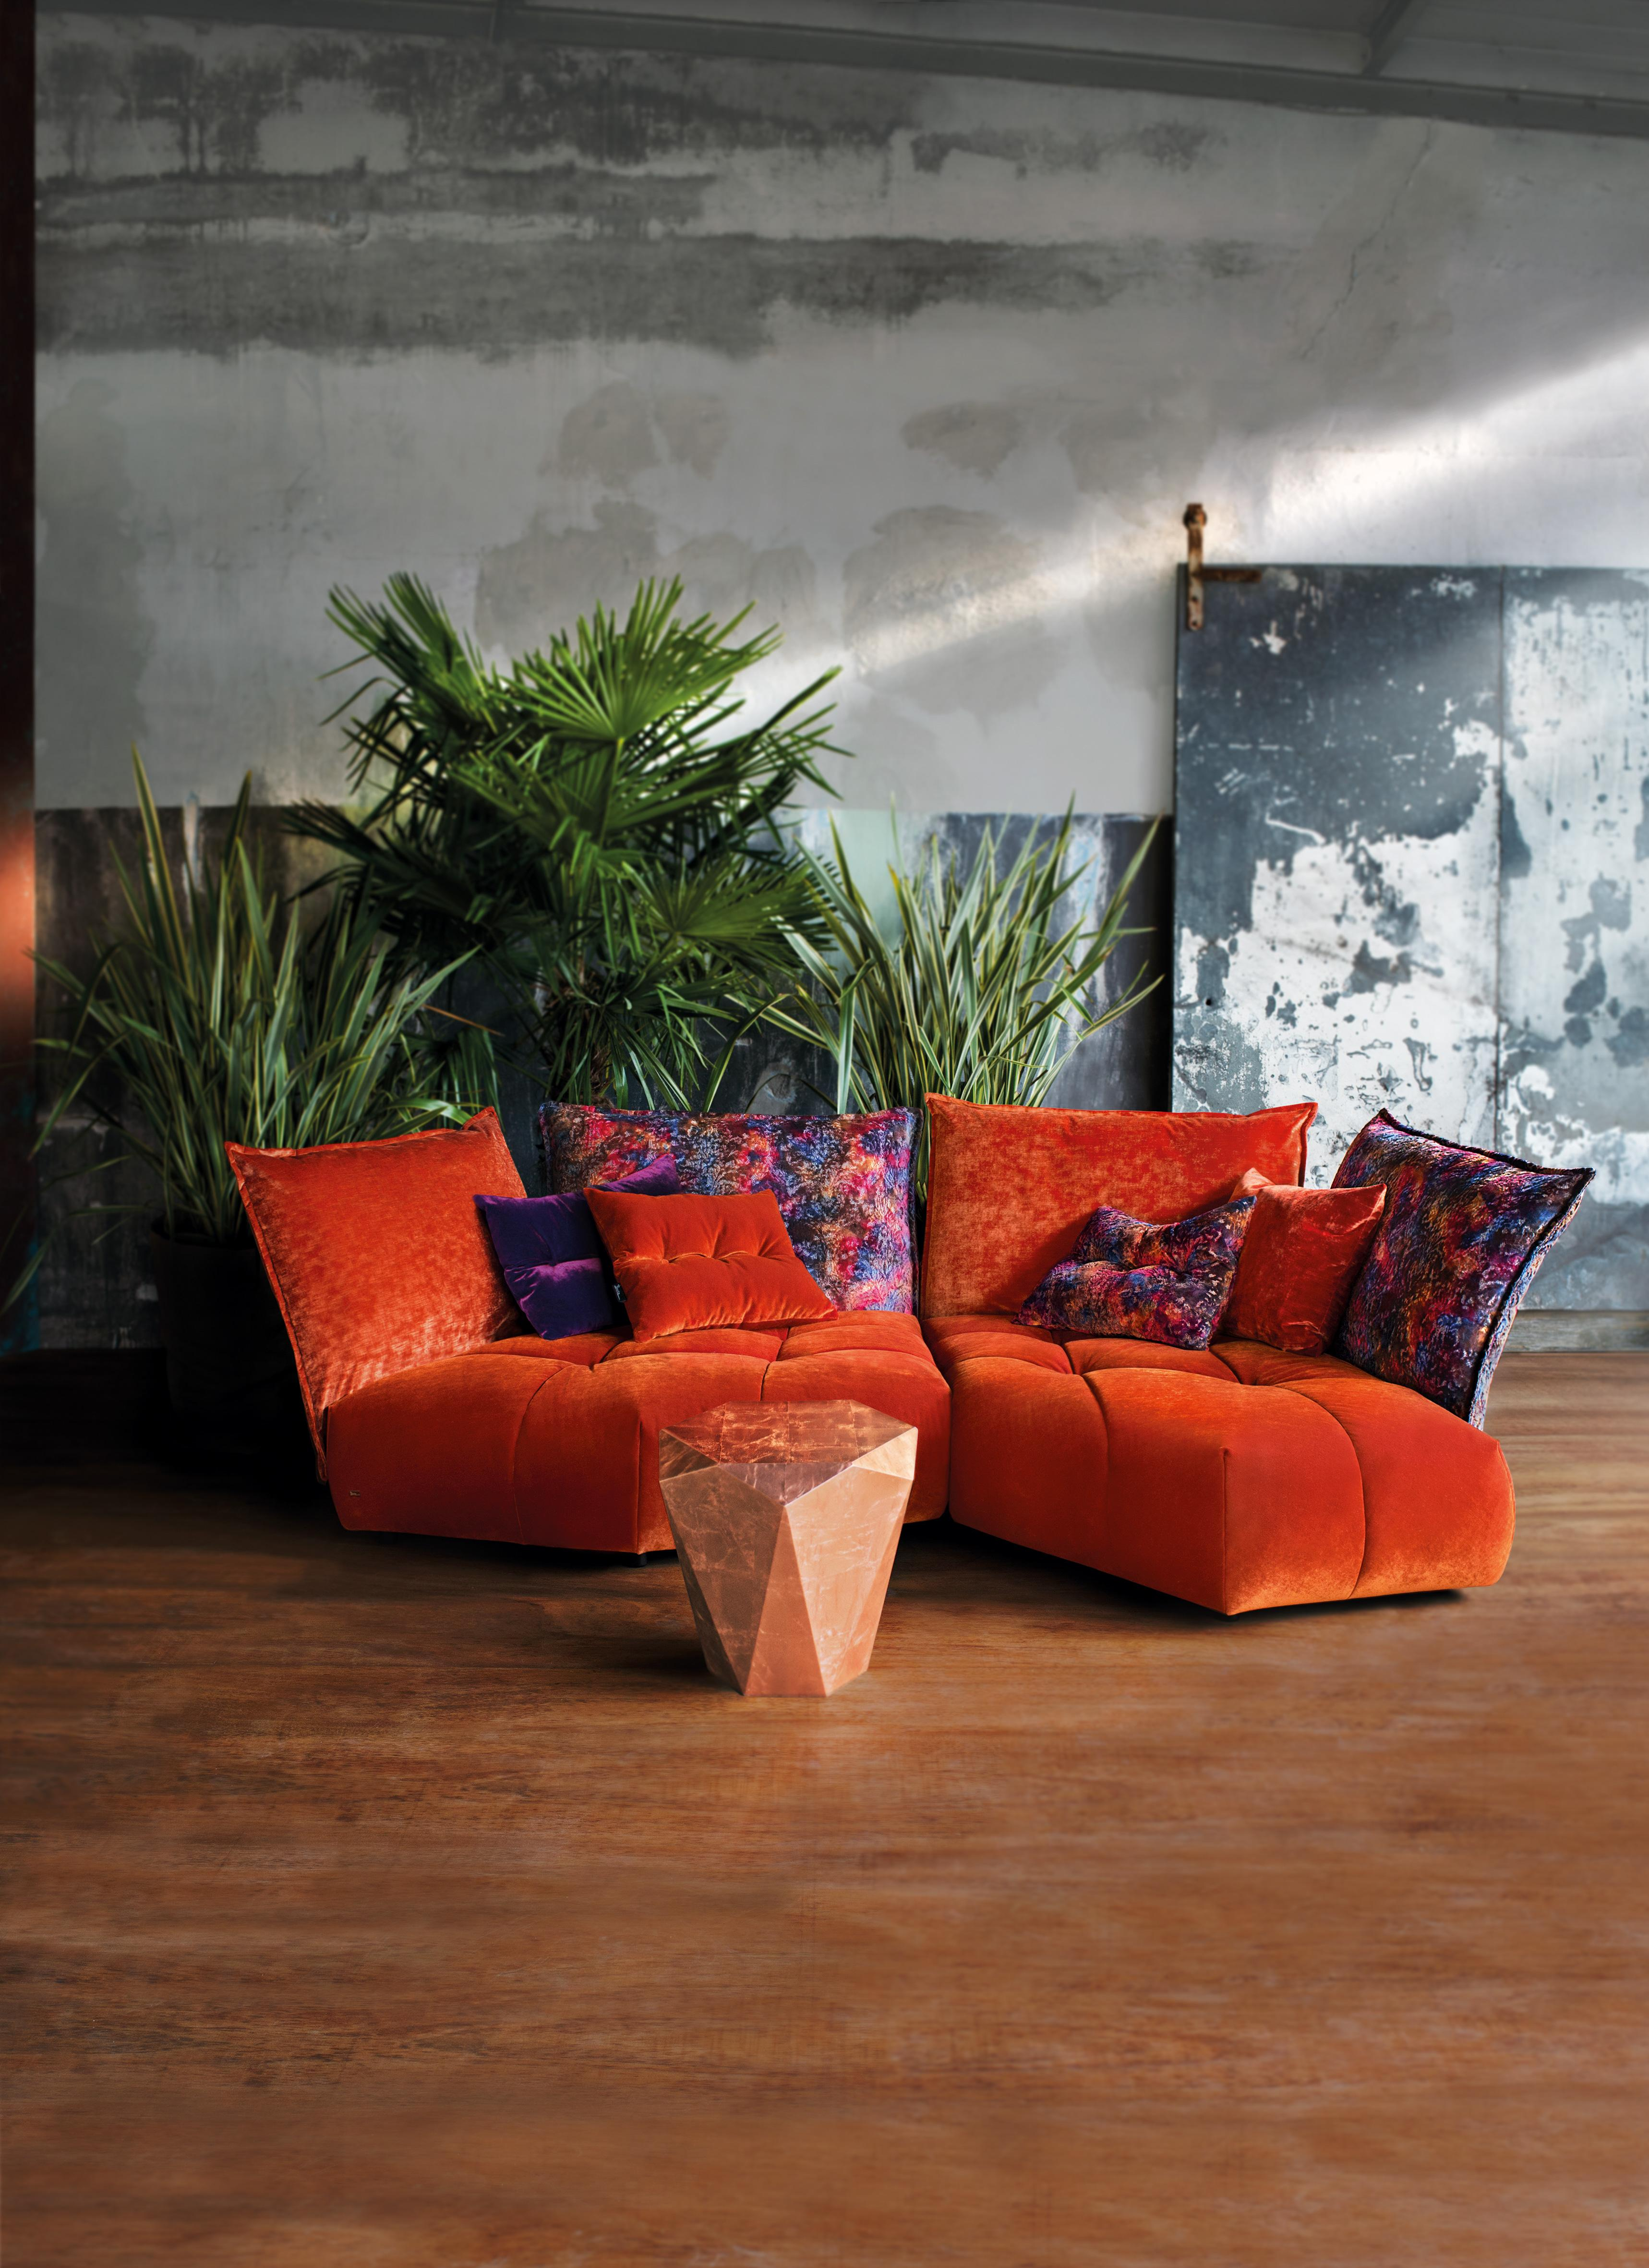 matilda kissen sofa bretz eva zocher couchstyle. Black Bedroom Furniture Sets. Home Design Ideas